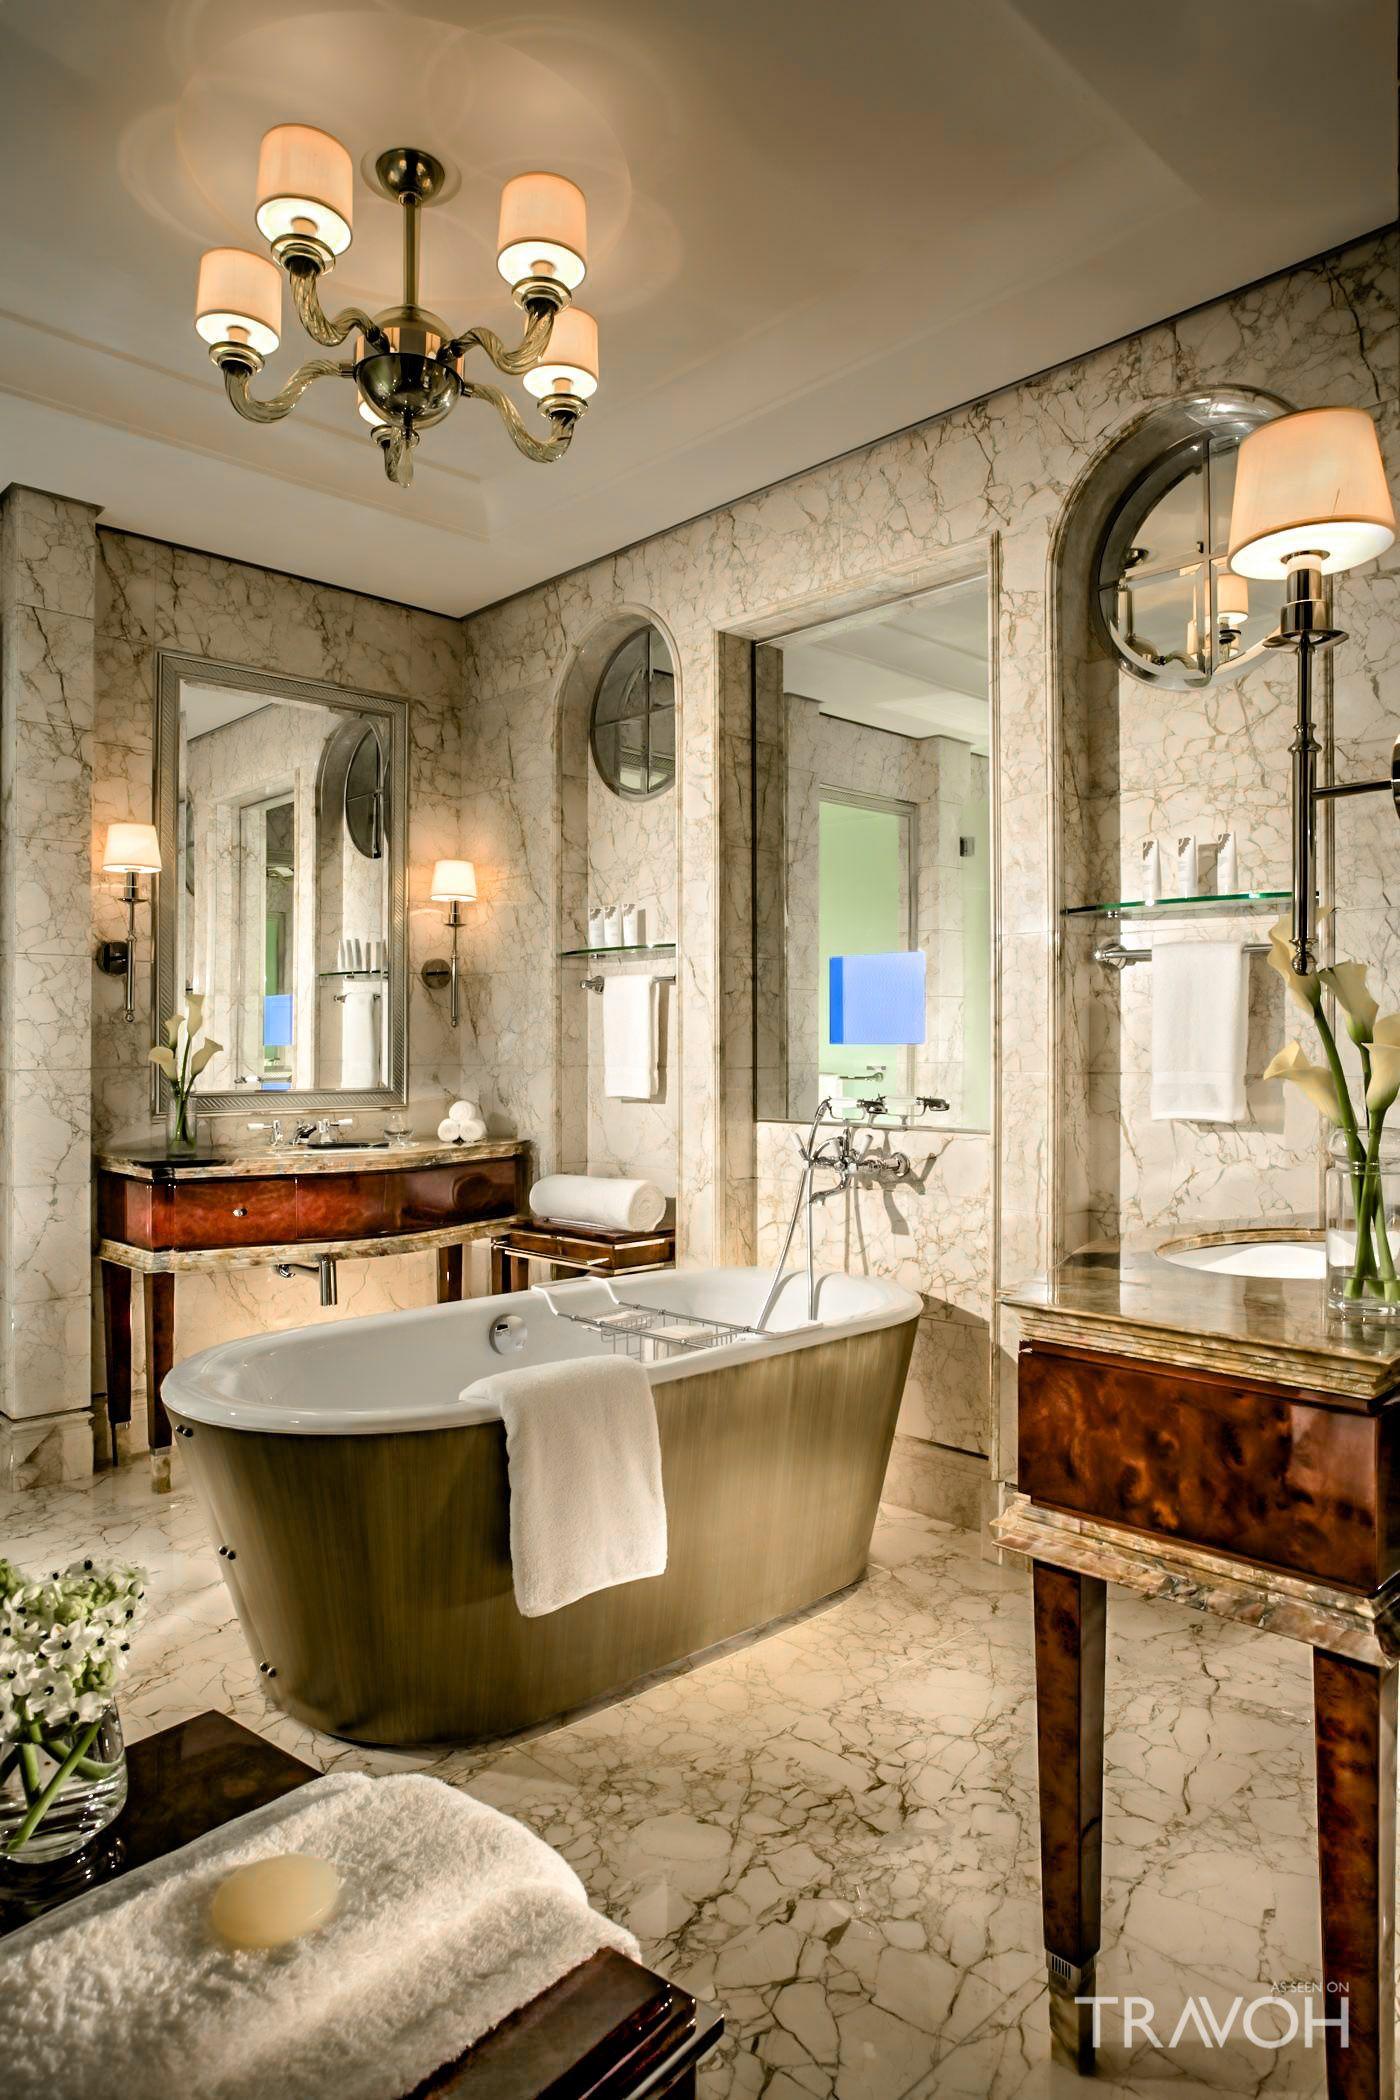 Luxury Hotel Bedrooms: St. Regis Luxury Hotel Singapore